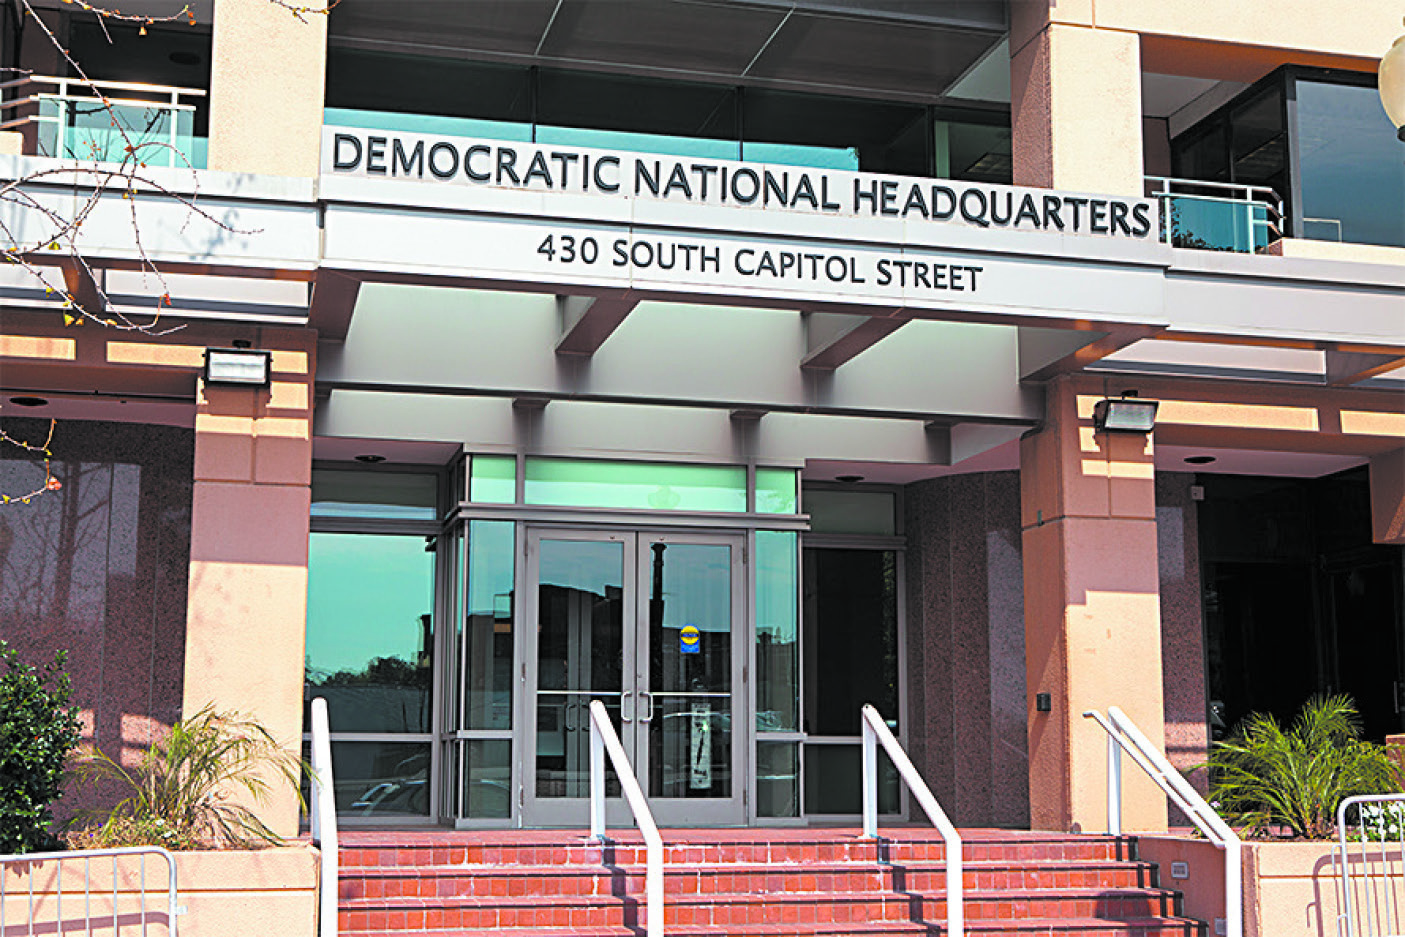 The Democratic National Committee headquarters in Washington on Sept. 10, 2016. (MARK VAN SCYOC/SHUTTERSTOCK)